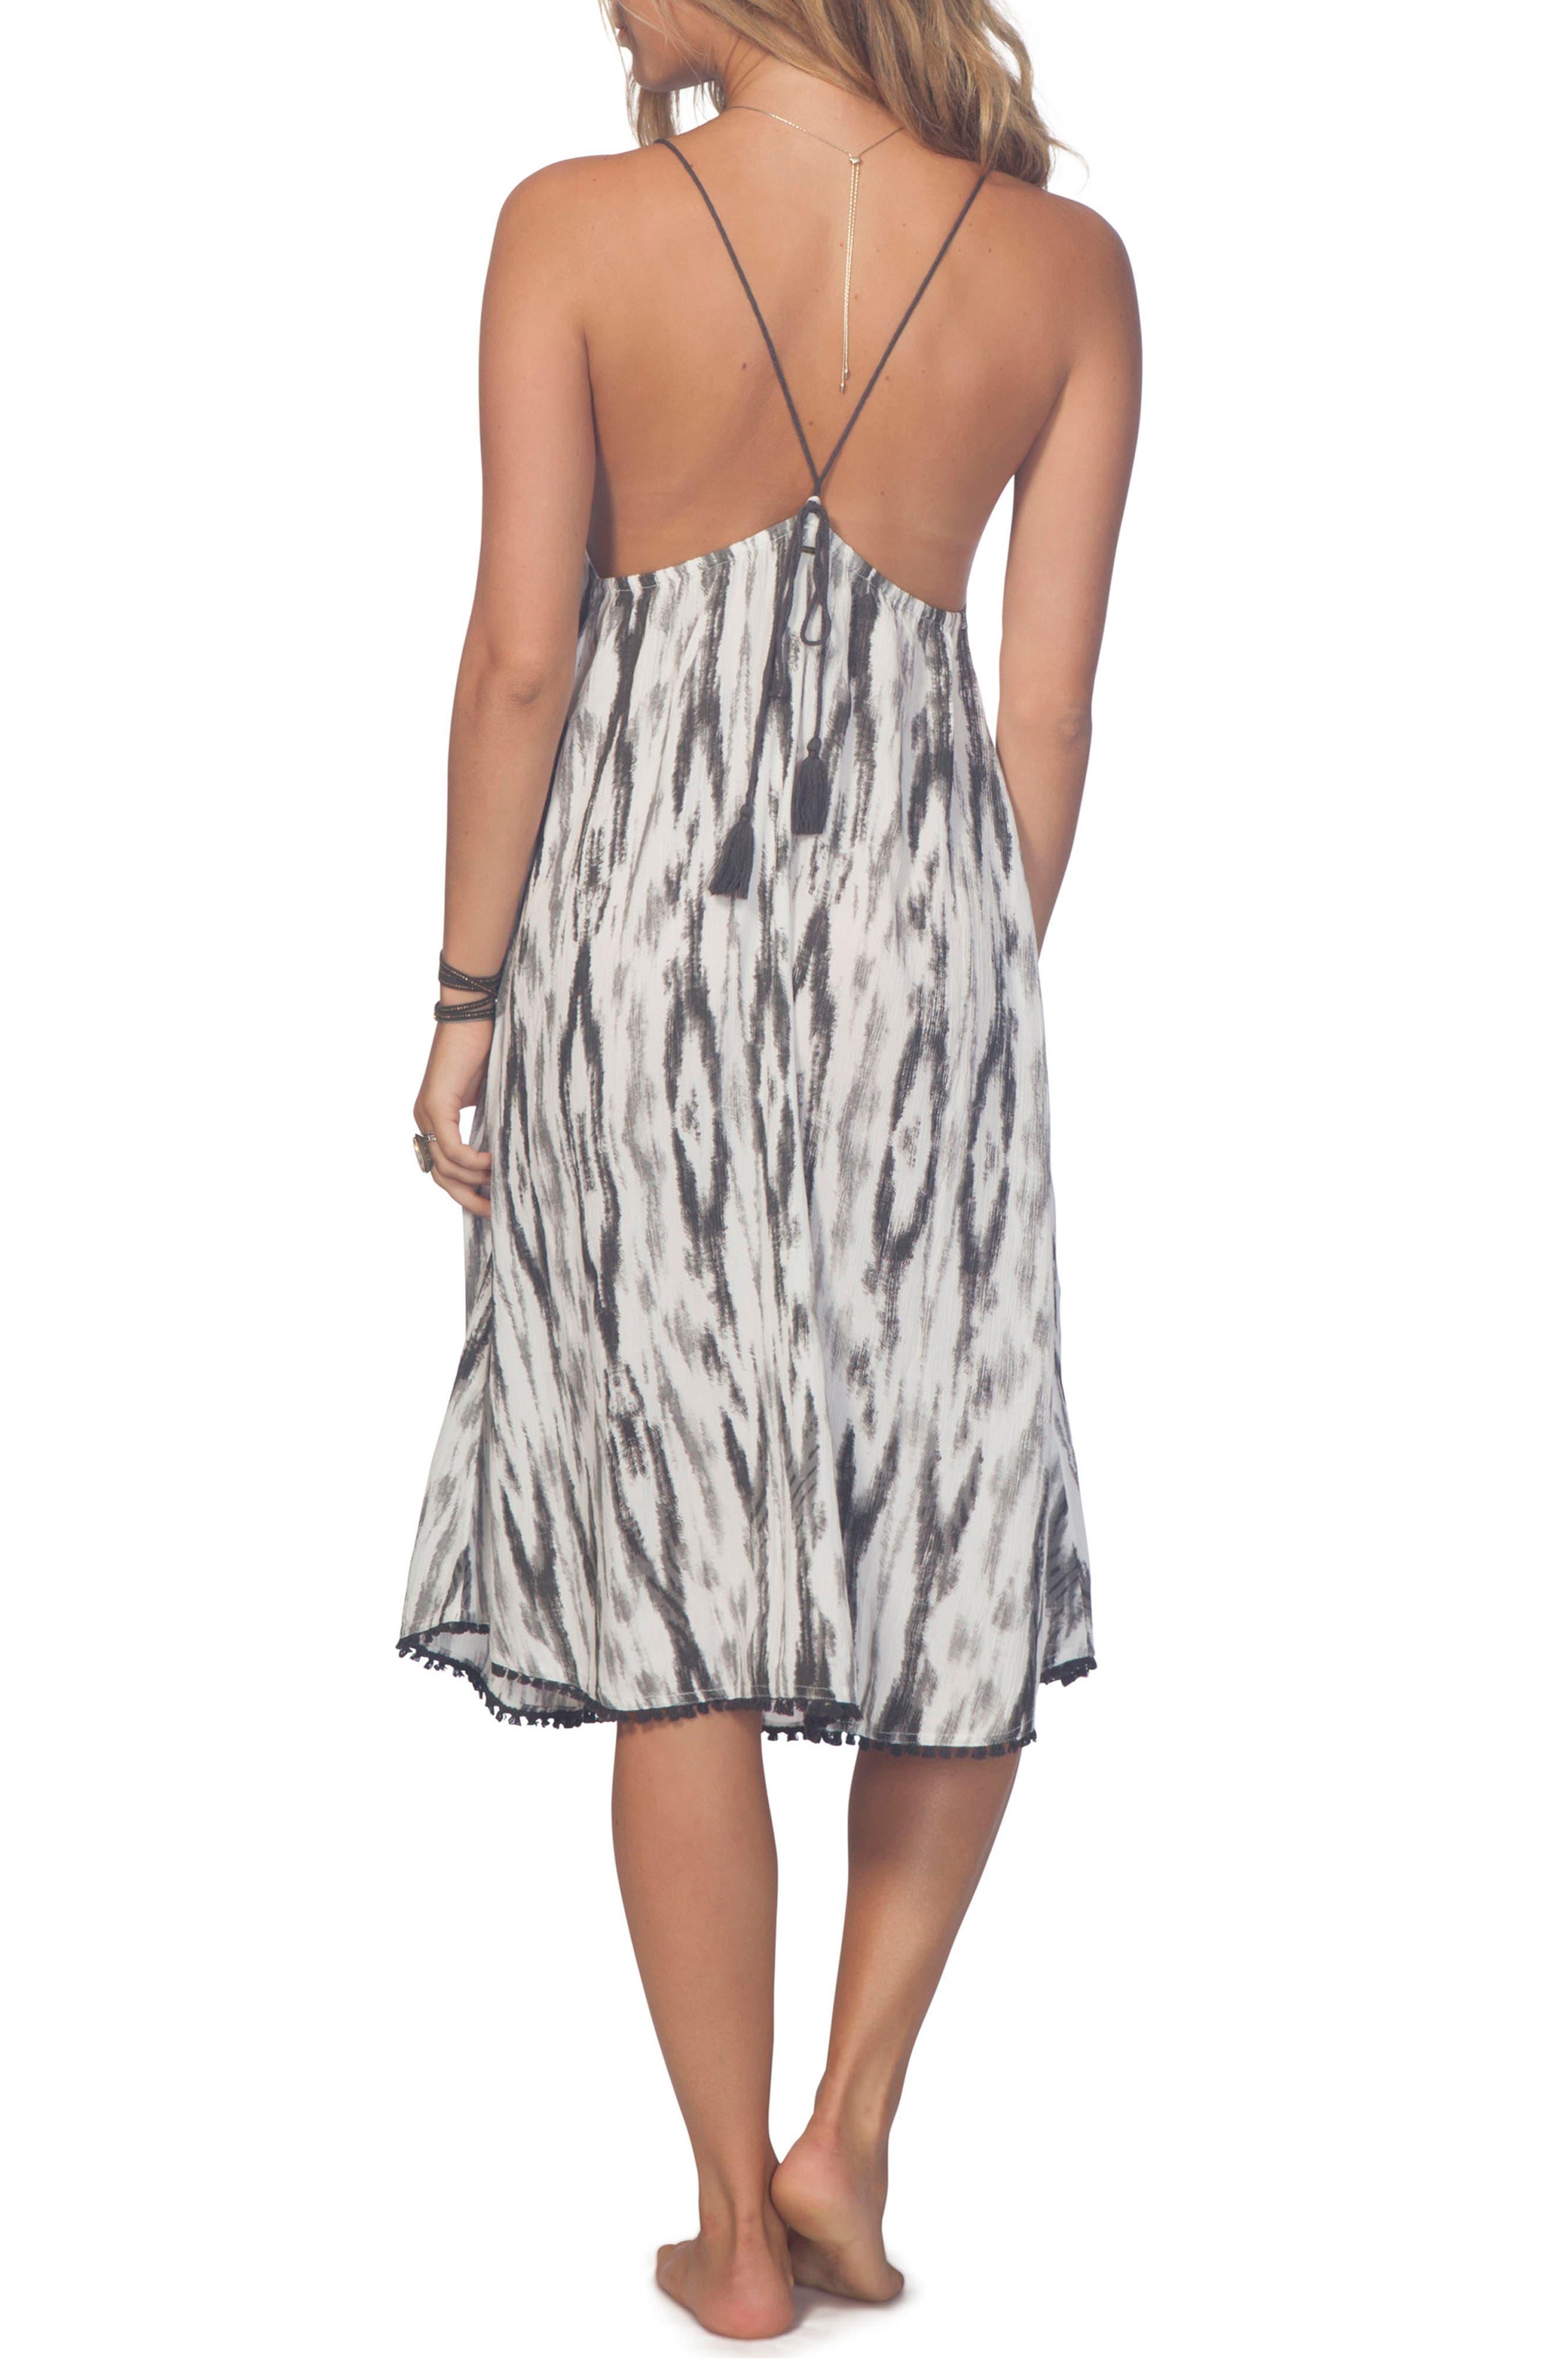 Wind Song Dress,                             Alternate thumbnail 2, color,                             White